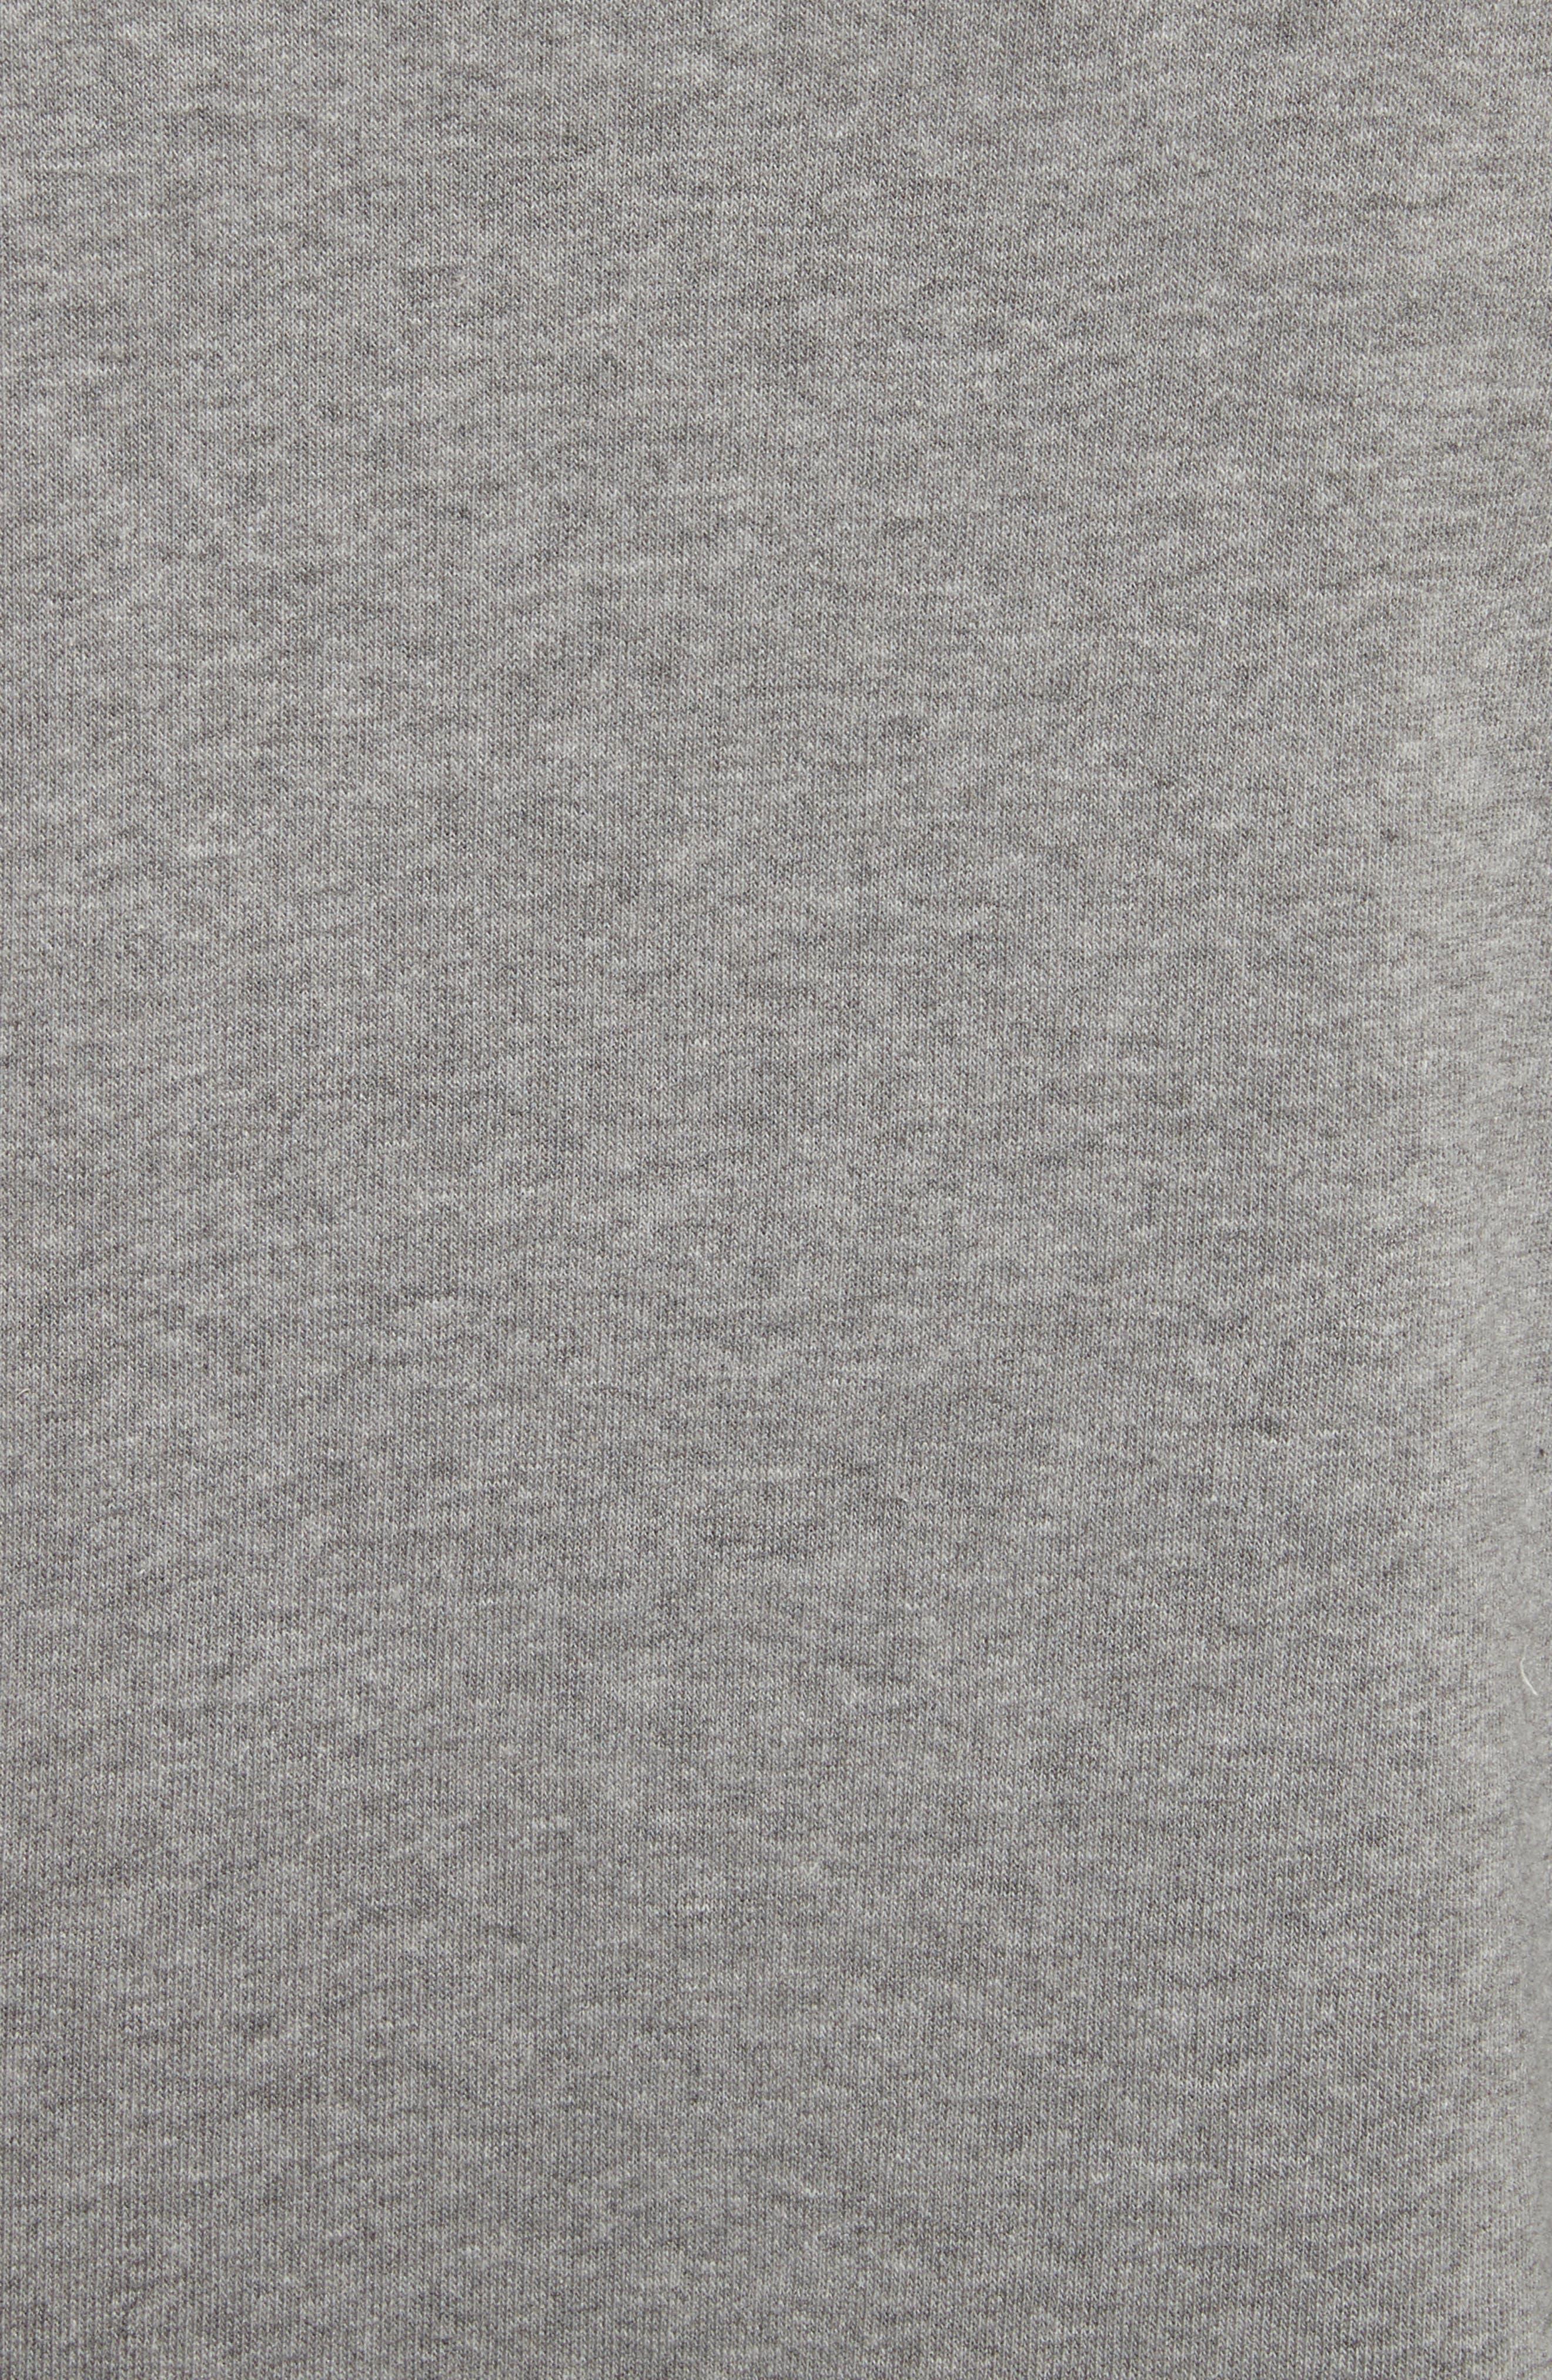 Lips & Hips Sweatshirt,                             Alternate thumbnail 5, color,                             Medium Heather Grey